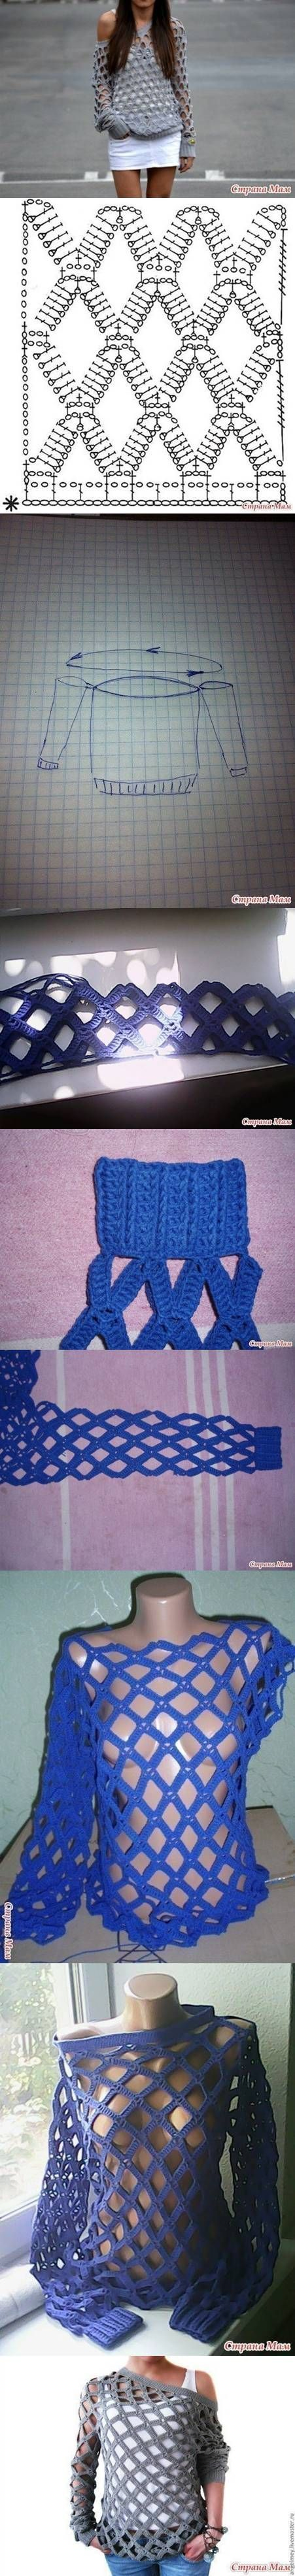 DIY Crochet Blouse DIY Projects | UsefulDIY.com Follow Us on Facebook ==> http://www.facebook.com/UsefulDiy